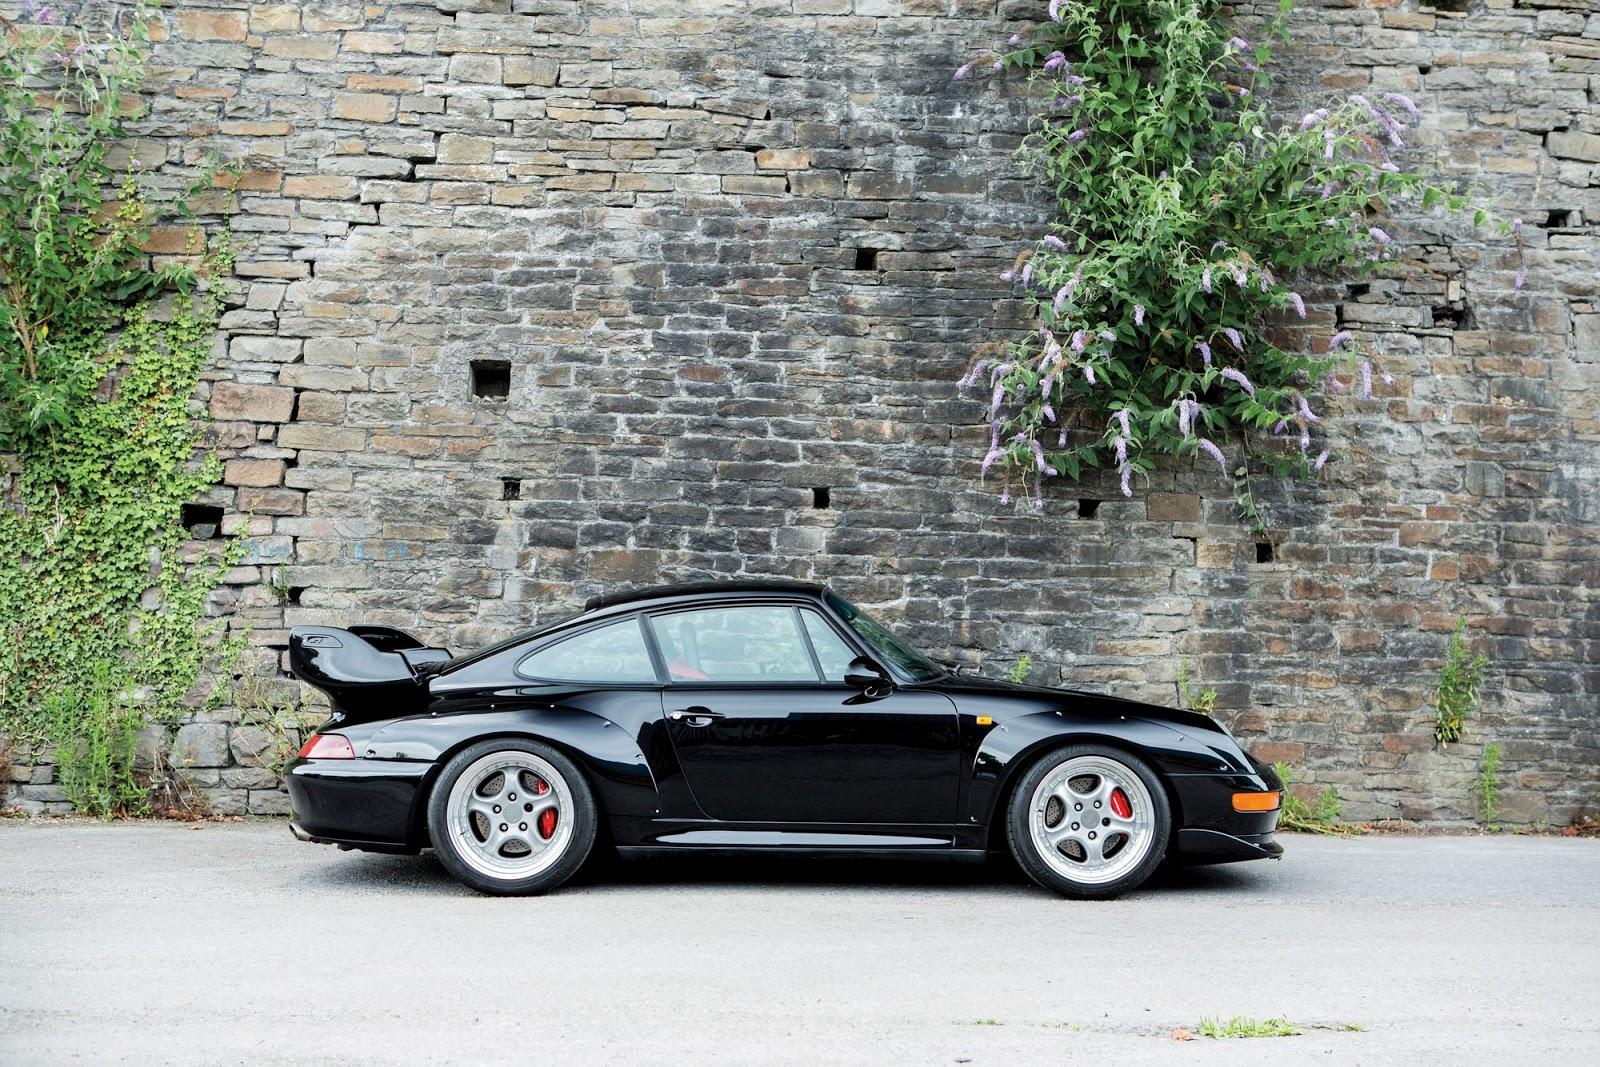 porsche 911 gt2 quarter mile time 700 rwhp supra turbo vs porsche 911 turbo gt2 1 4 mile drag. Black Bedroom Furniture Sets. Home Design Ideas